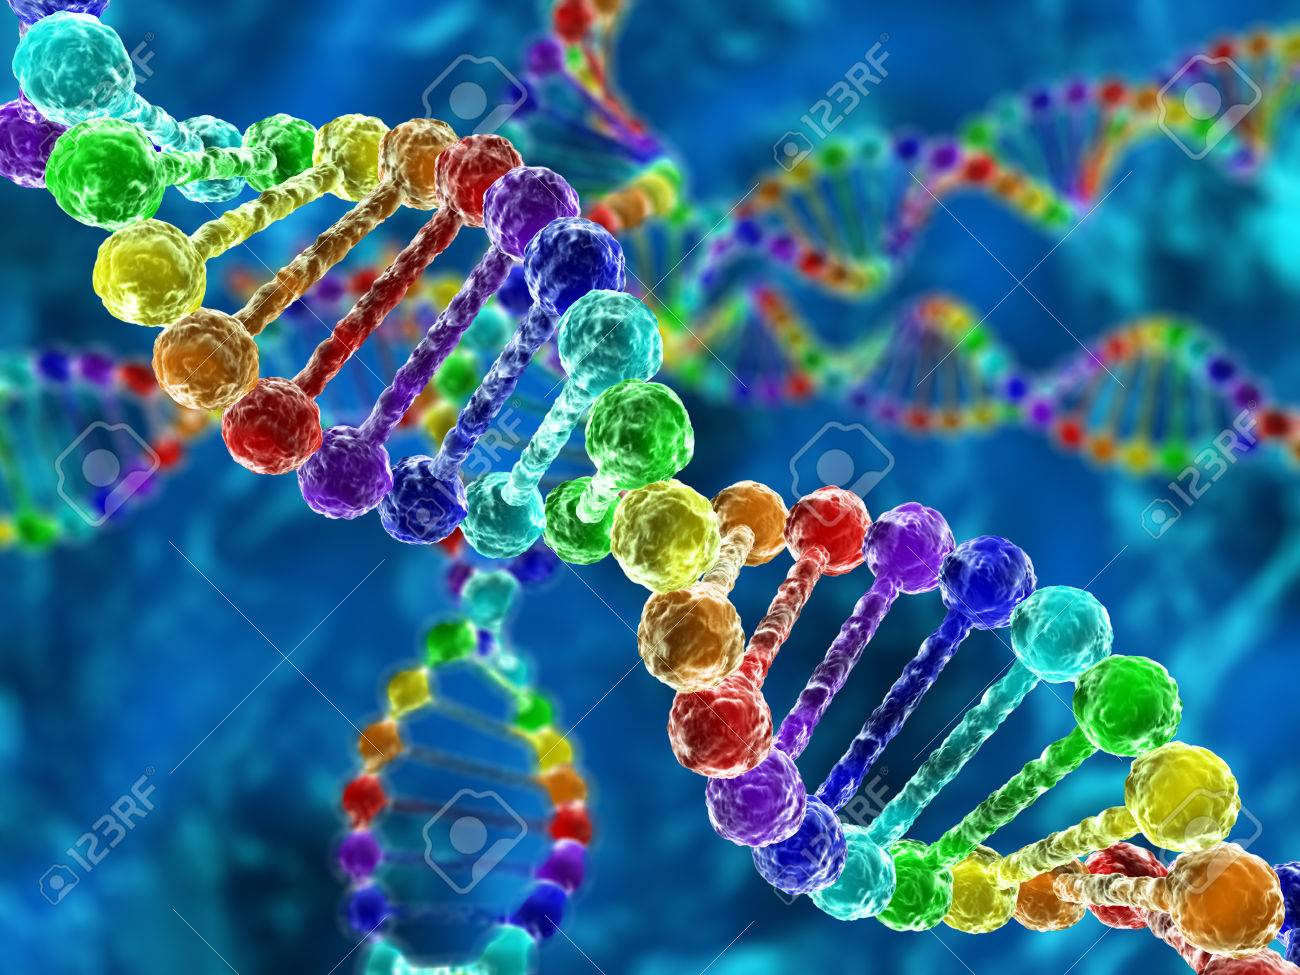 Rainbow DNA (deoxyribonucleic acid) with defocus on background - 36295199